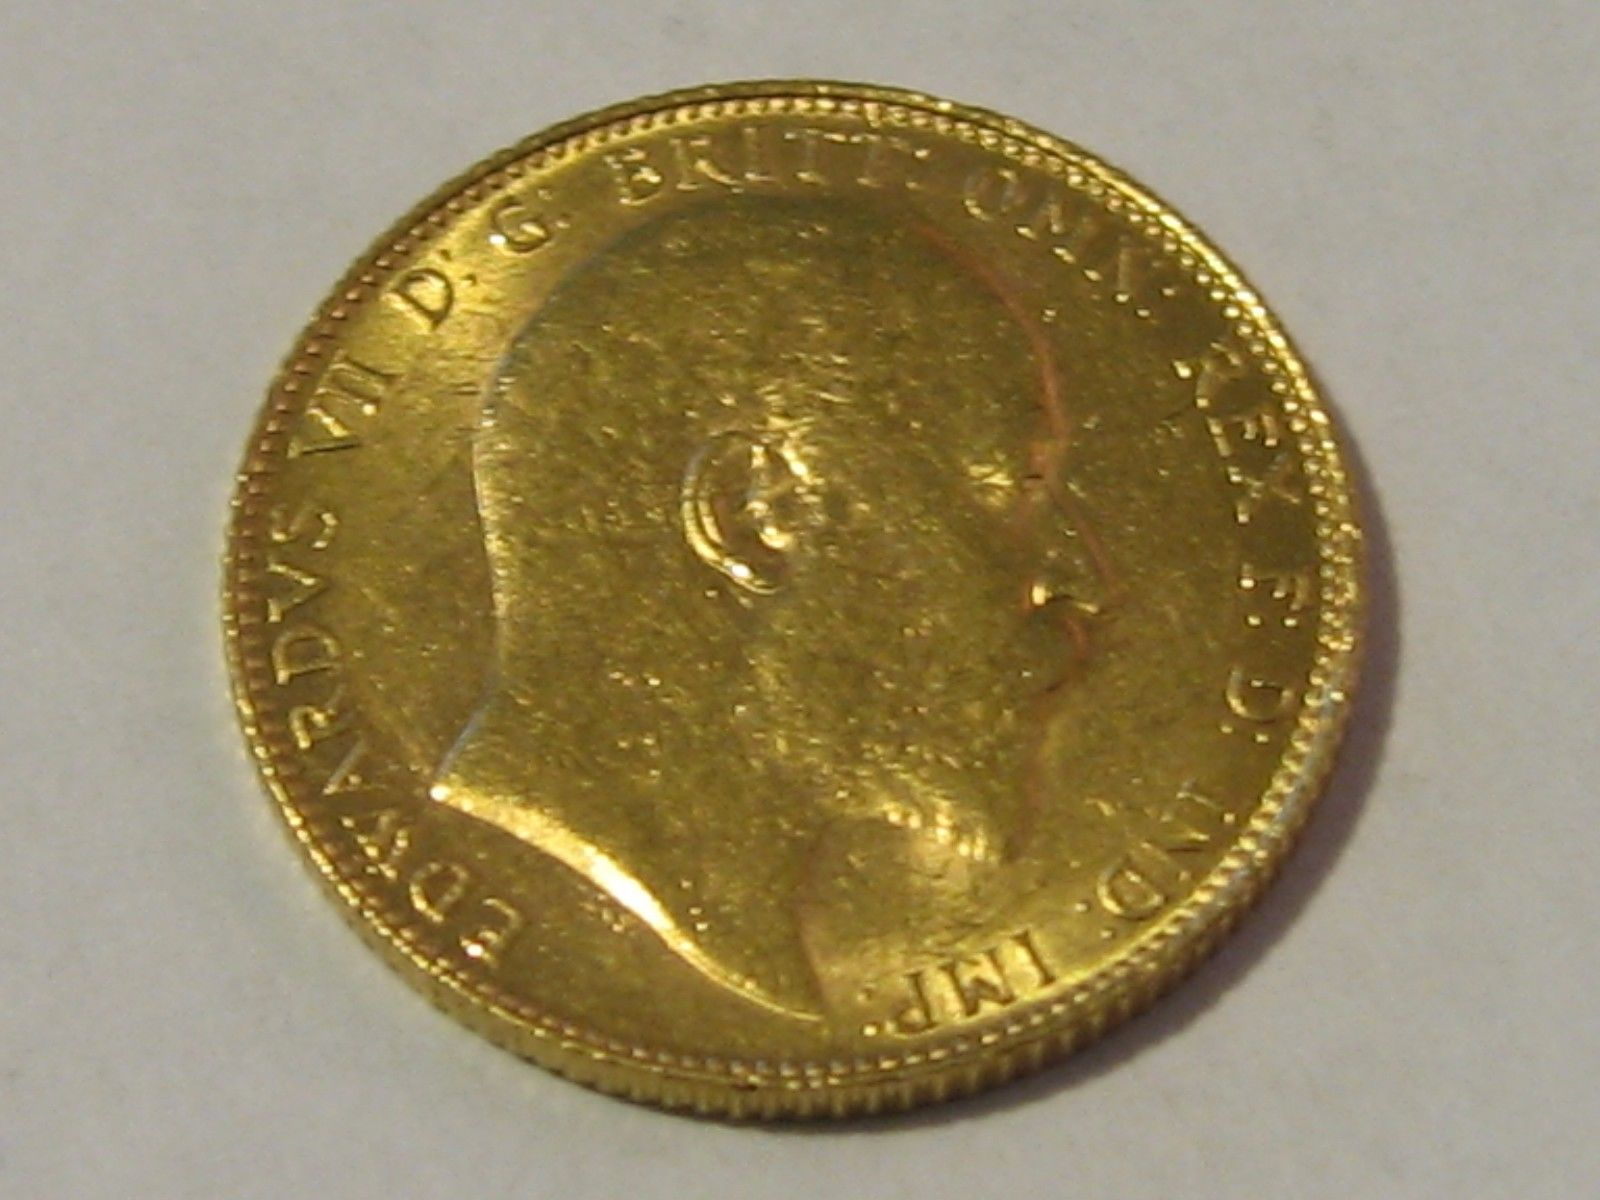 1906 1/4 oz BRITISH GOLD SOVEREIGN KING EDWARD VII, GOLD